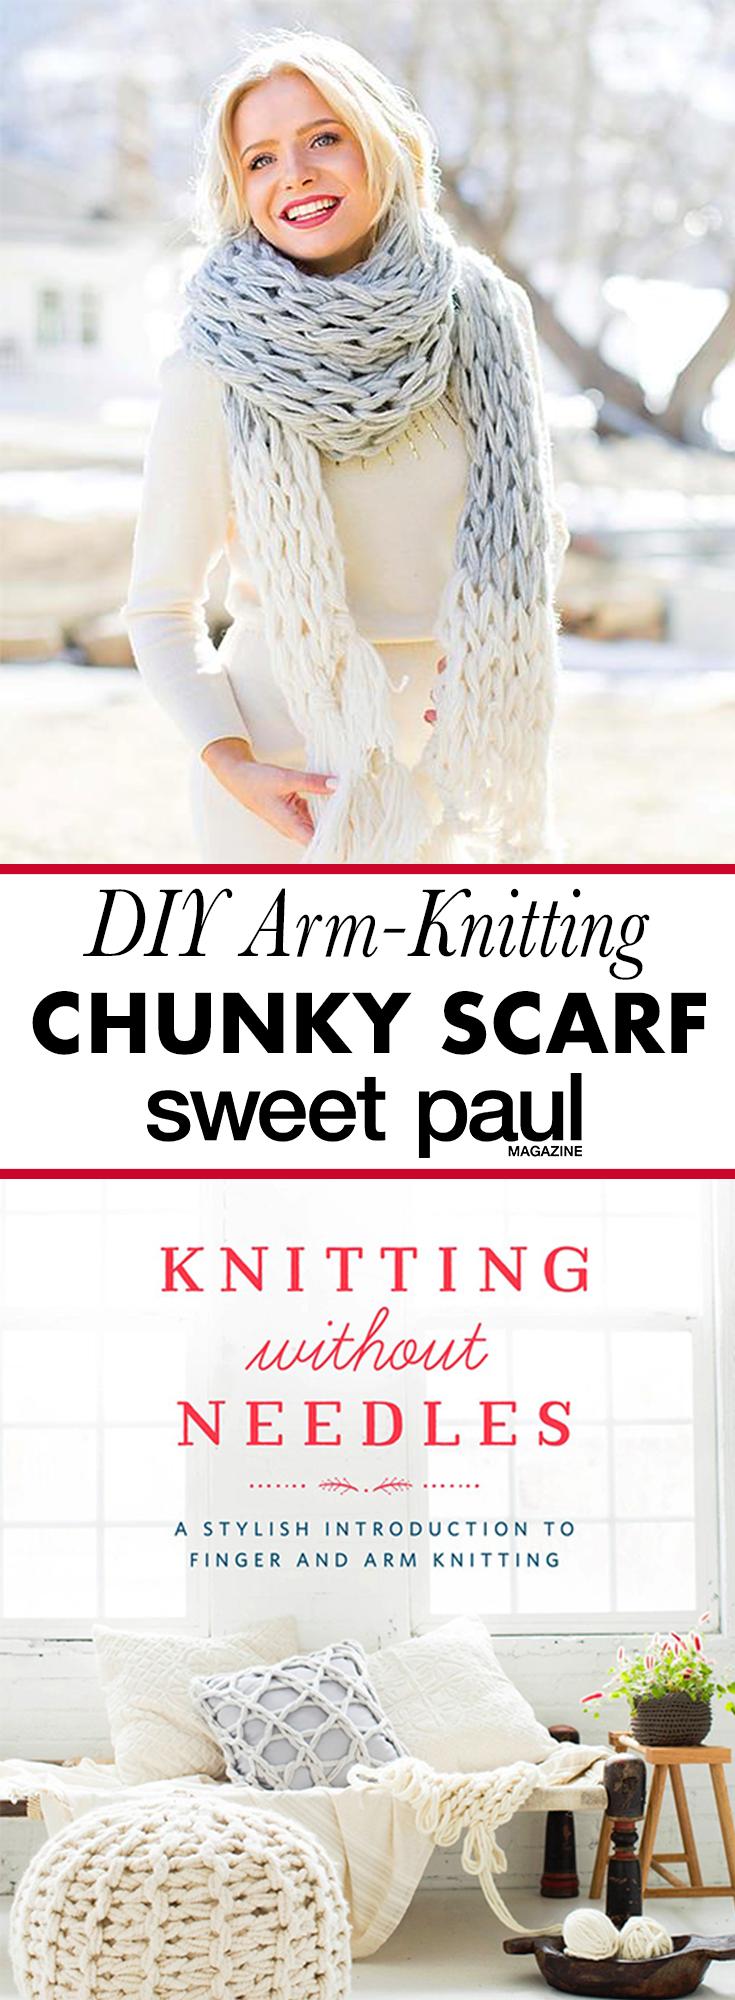 Giant Arm Knit Scarf by Anne Weil of Flax & Twine | Sweet Paul Magazine